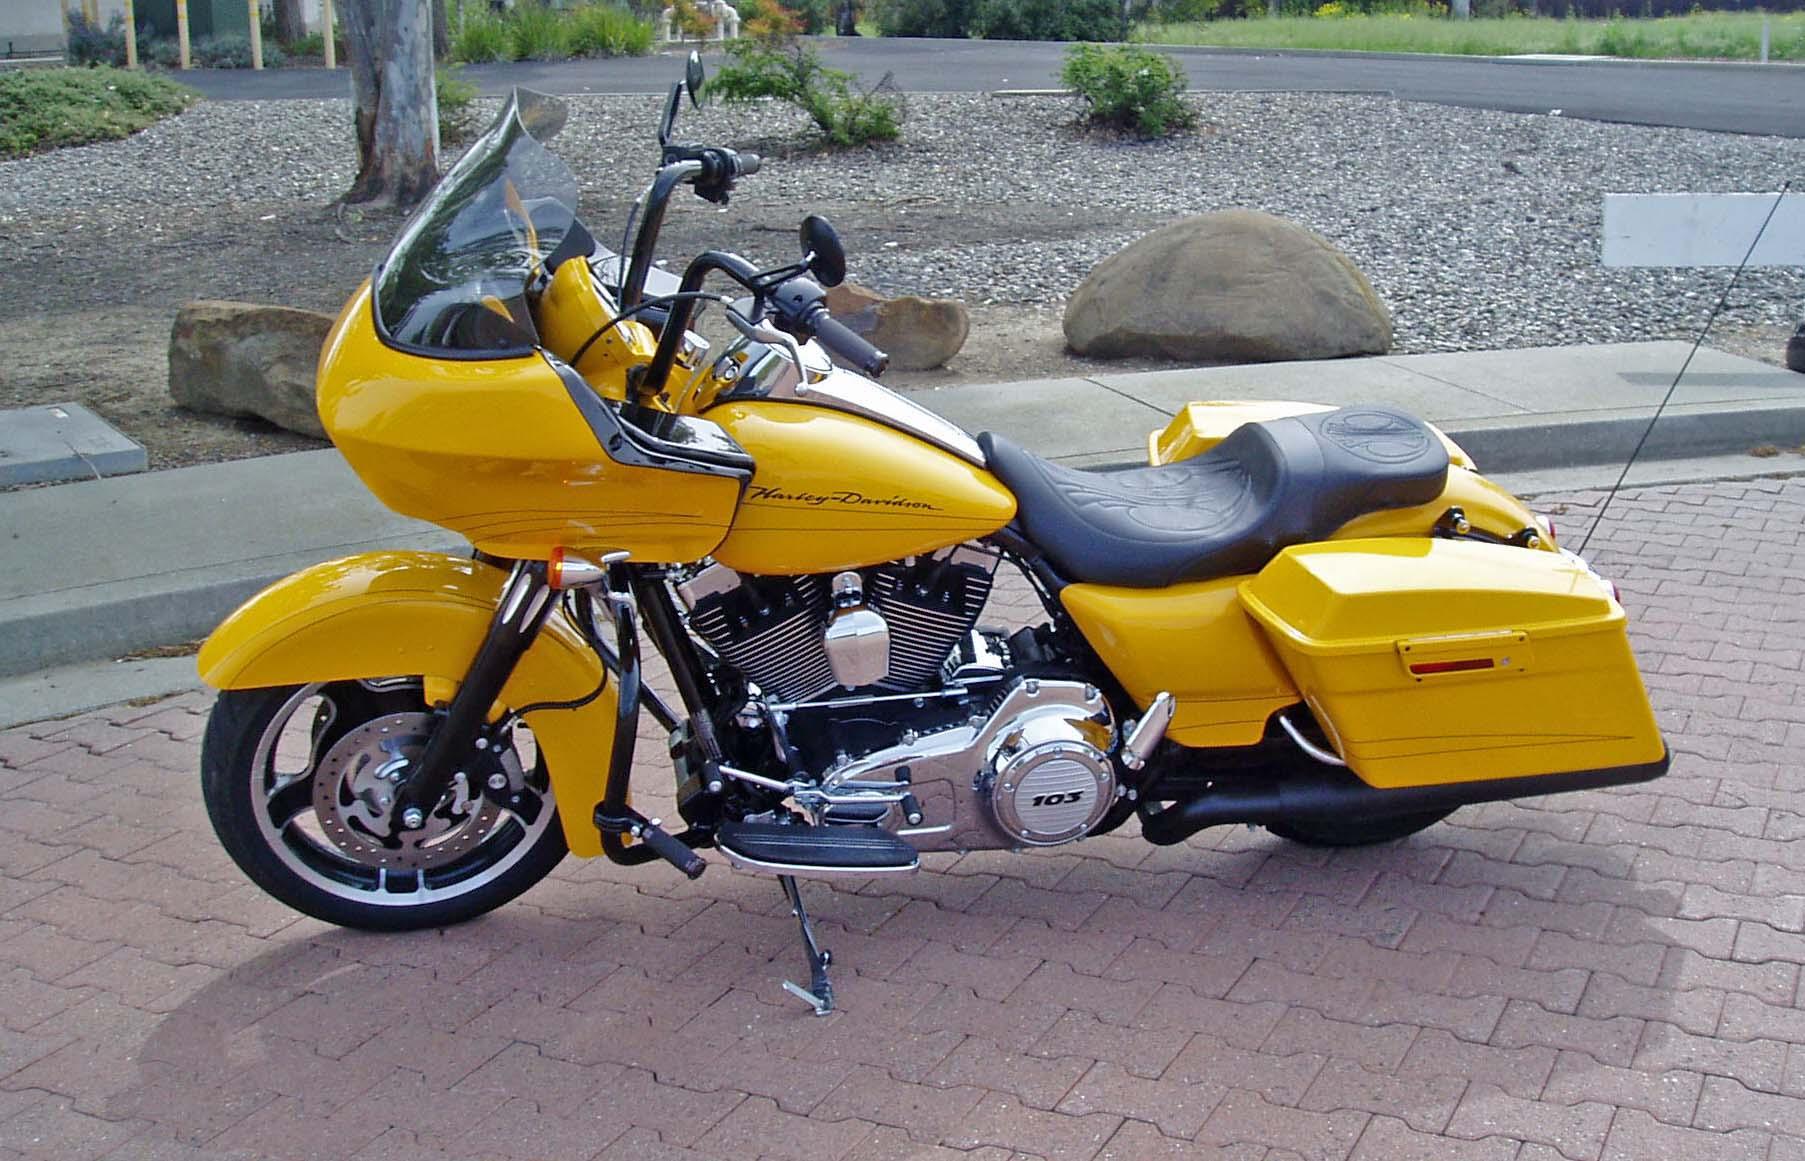 2012 Harley Davidson FLTRX Road Glide Custom Slick Custom Bagger